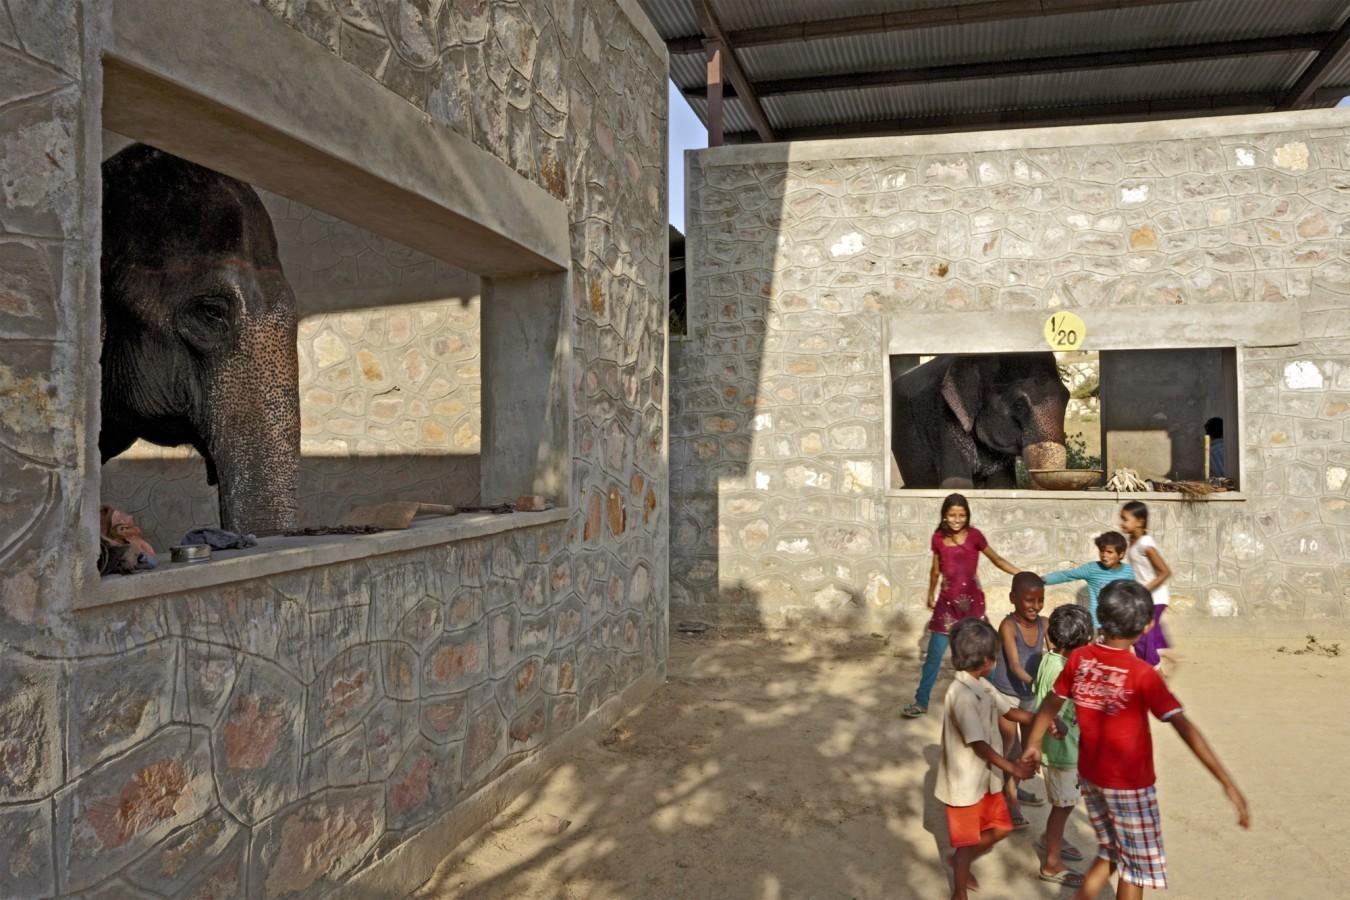 Hathi Gaon by Rahul Mehrotra: An unusual village - Sheet5